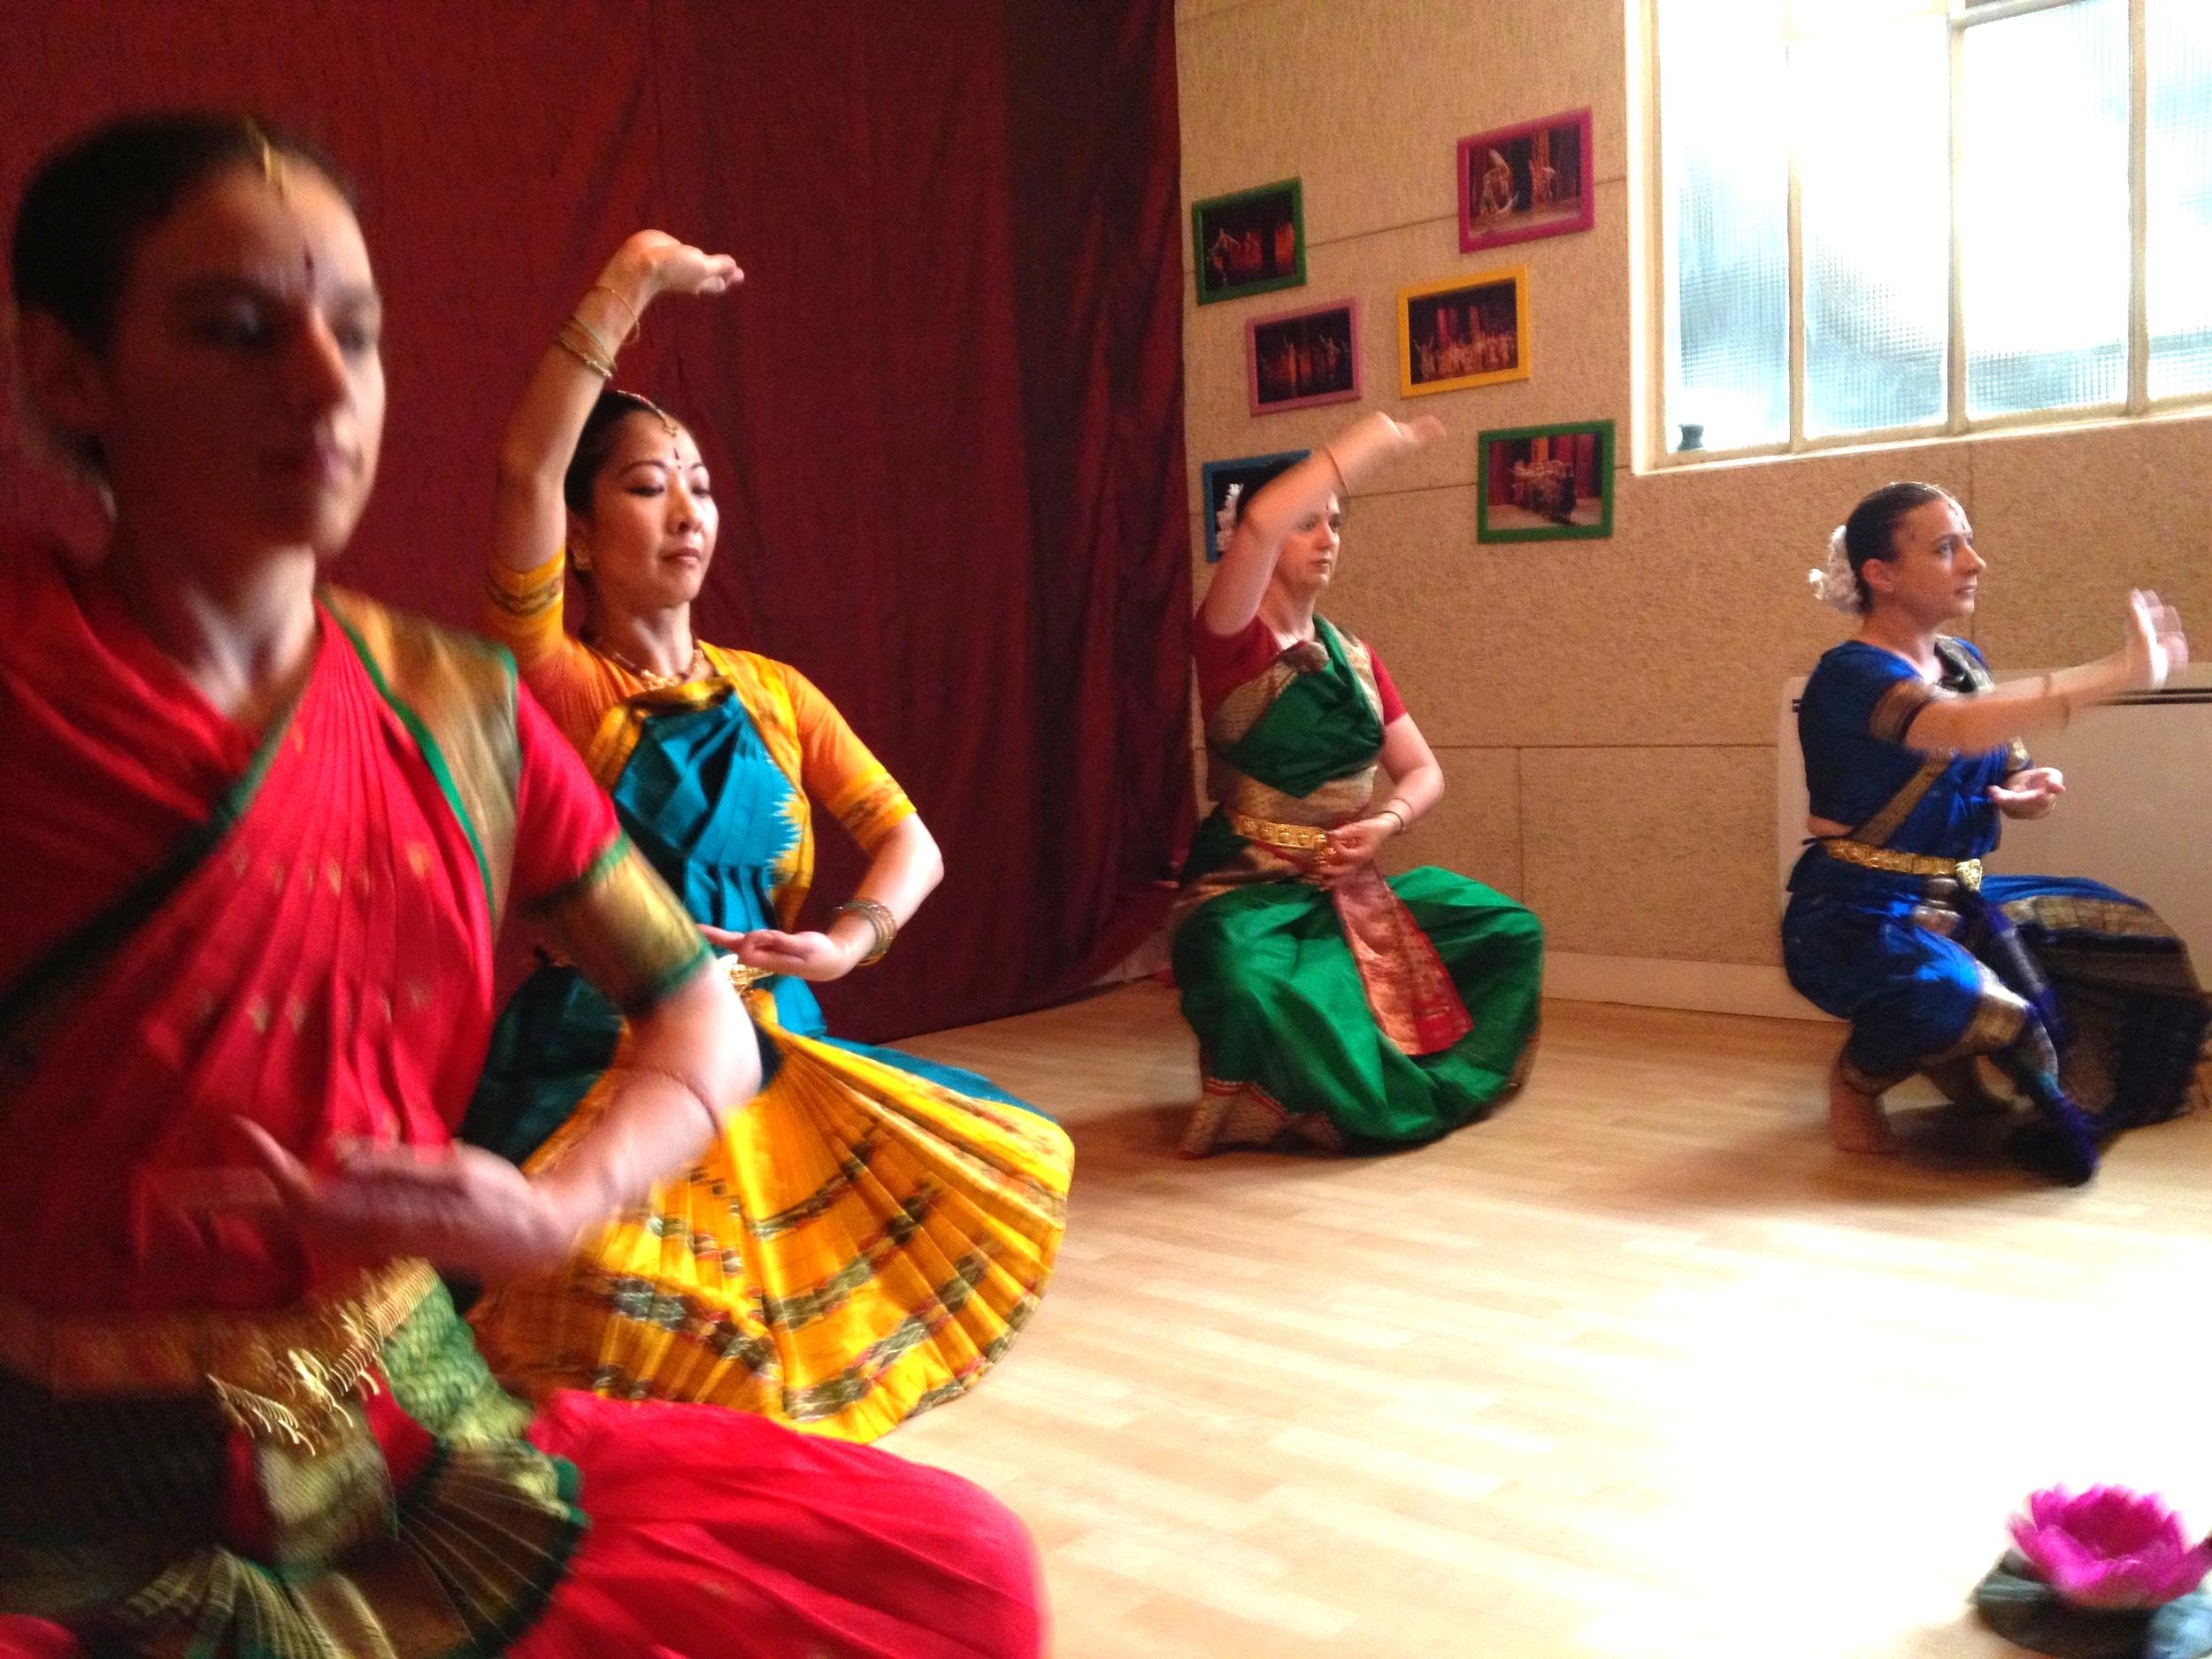 danse-indienne-cours-7.jpg